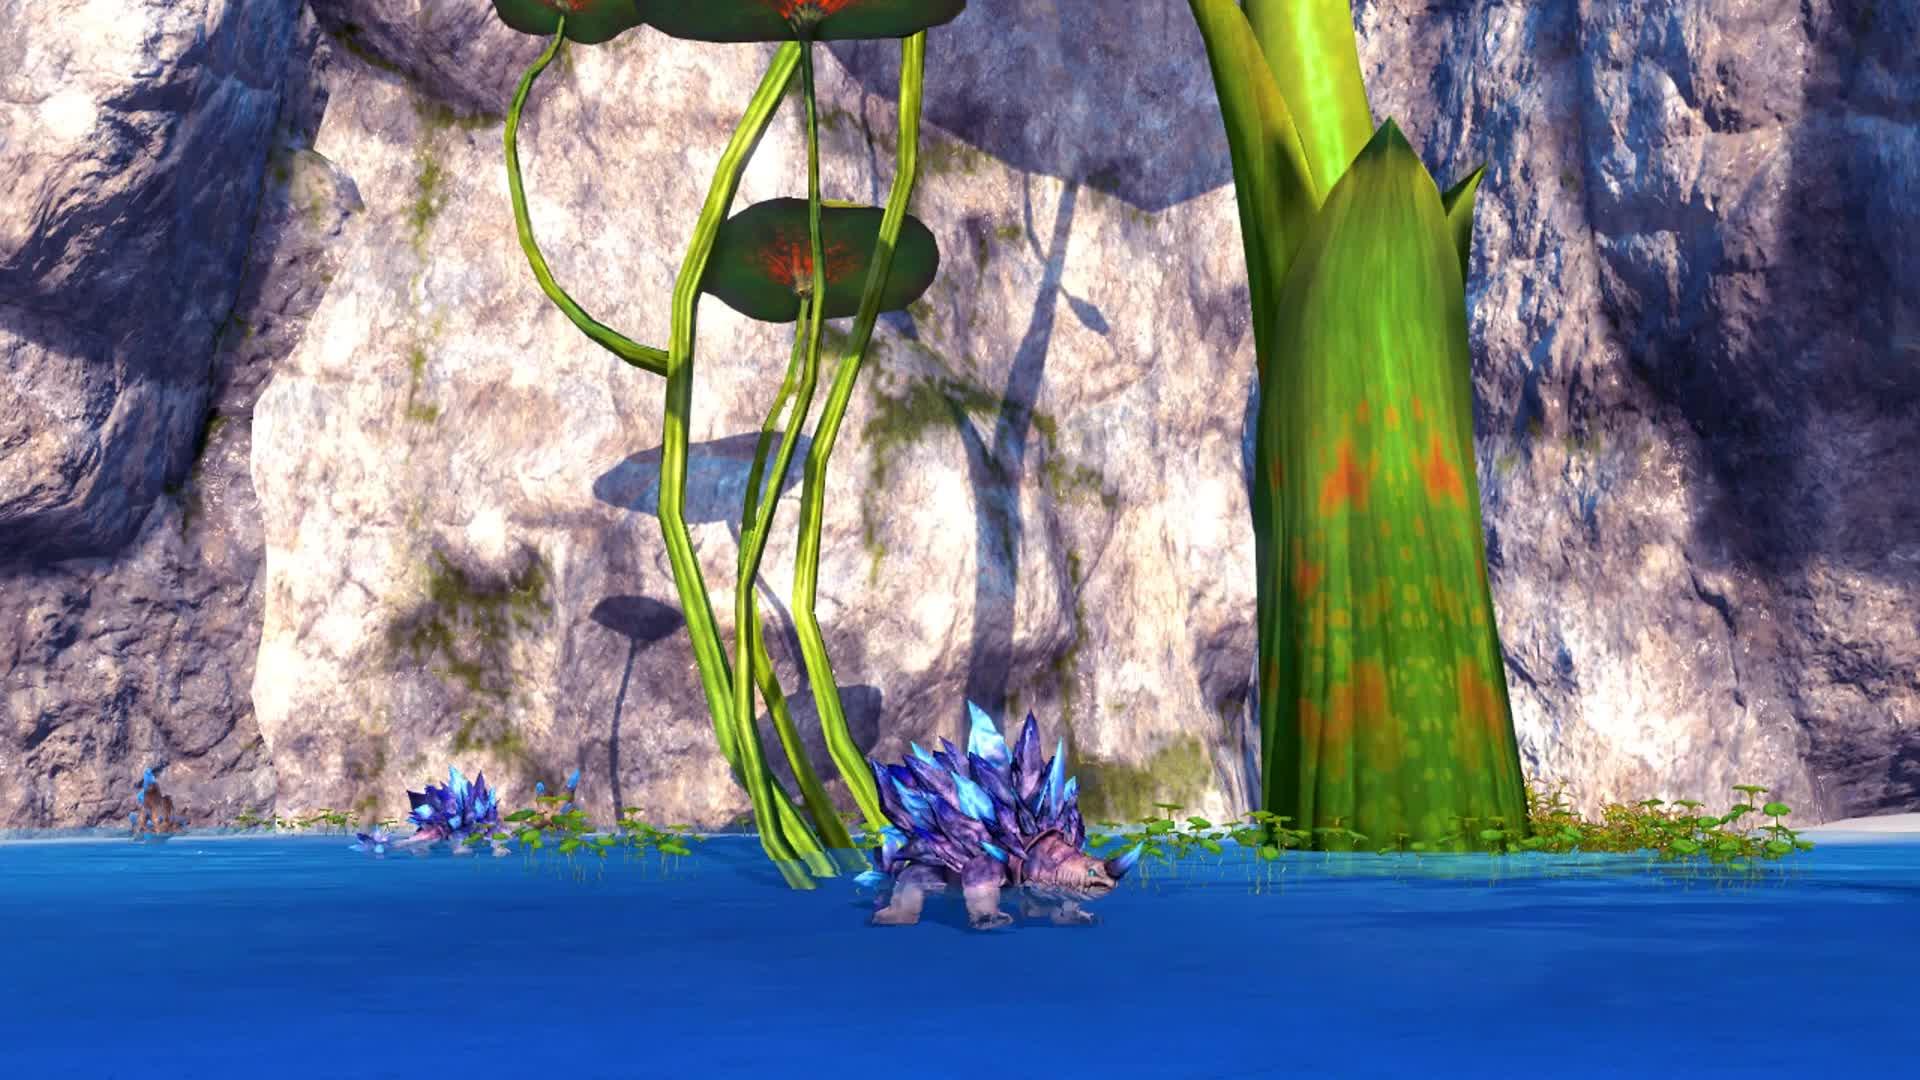 Blade And Soul Sapphire Basin Черепашки - живые обои